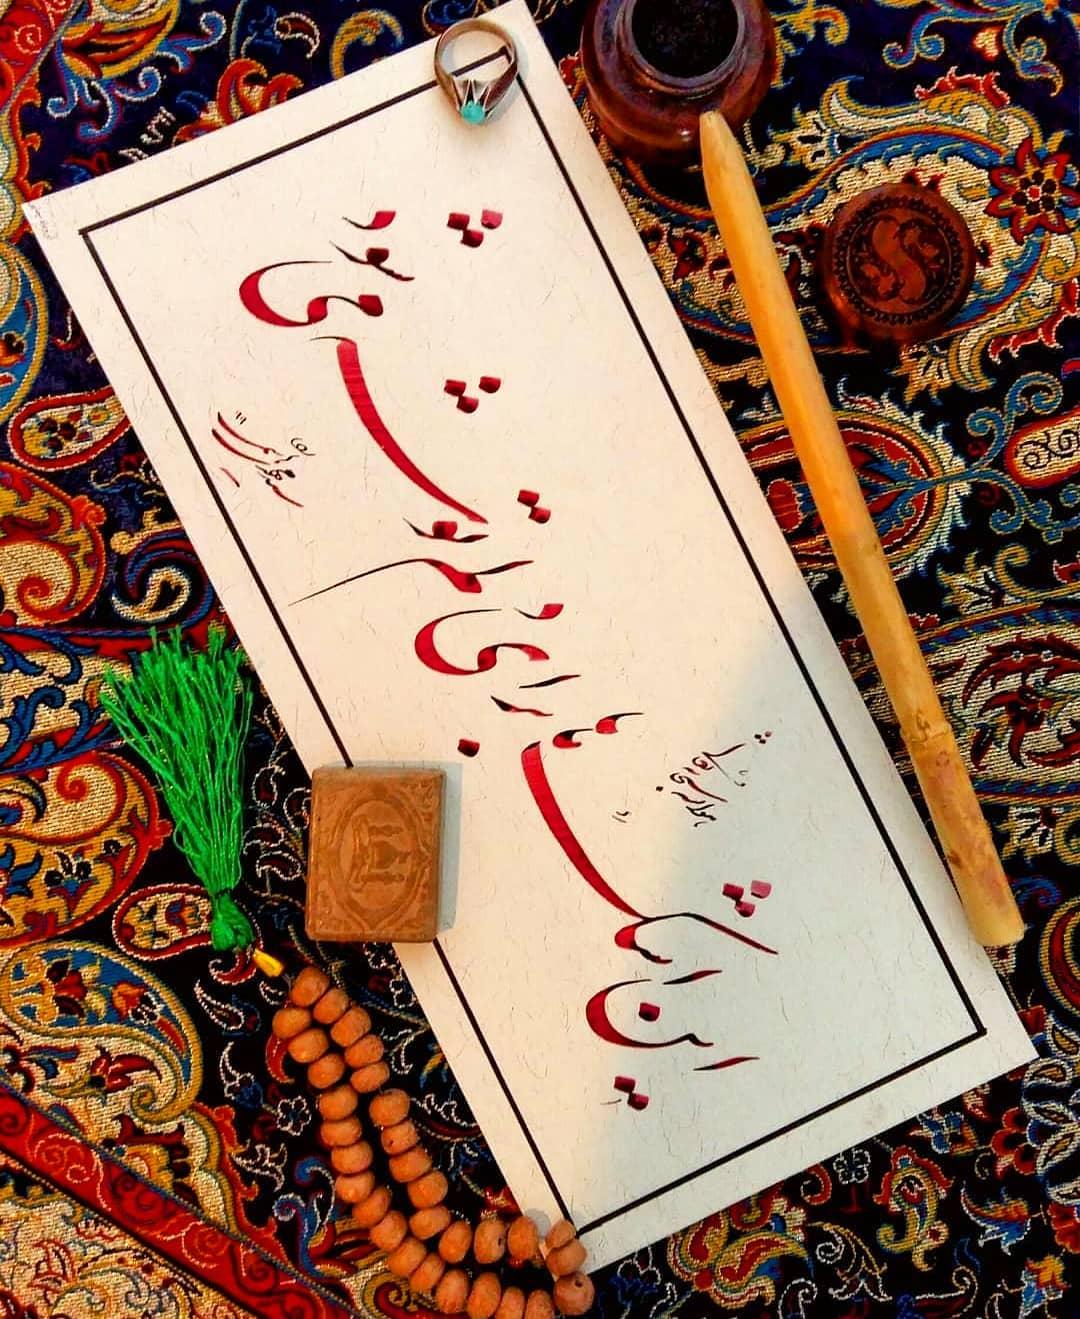 Farisi/Nasta'liq khatestan  ﷽ این اشک ها برای دلم توشه می شود . . .  @khatestan  @s.m.hashemi60 … 676